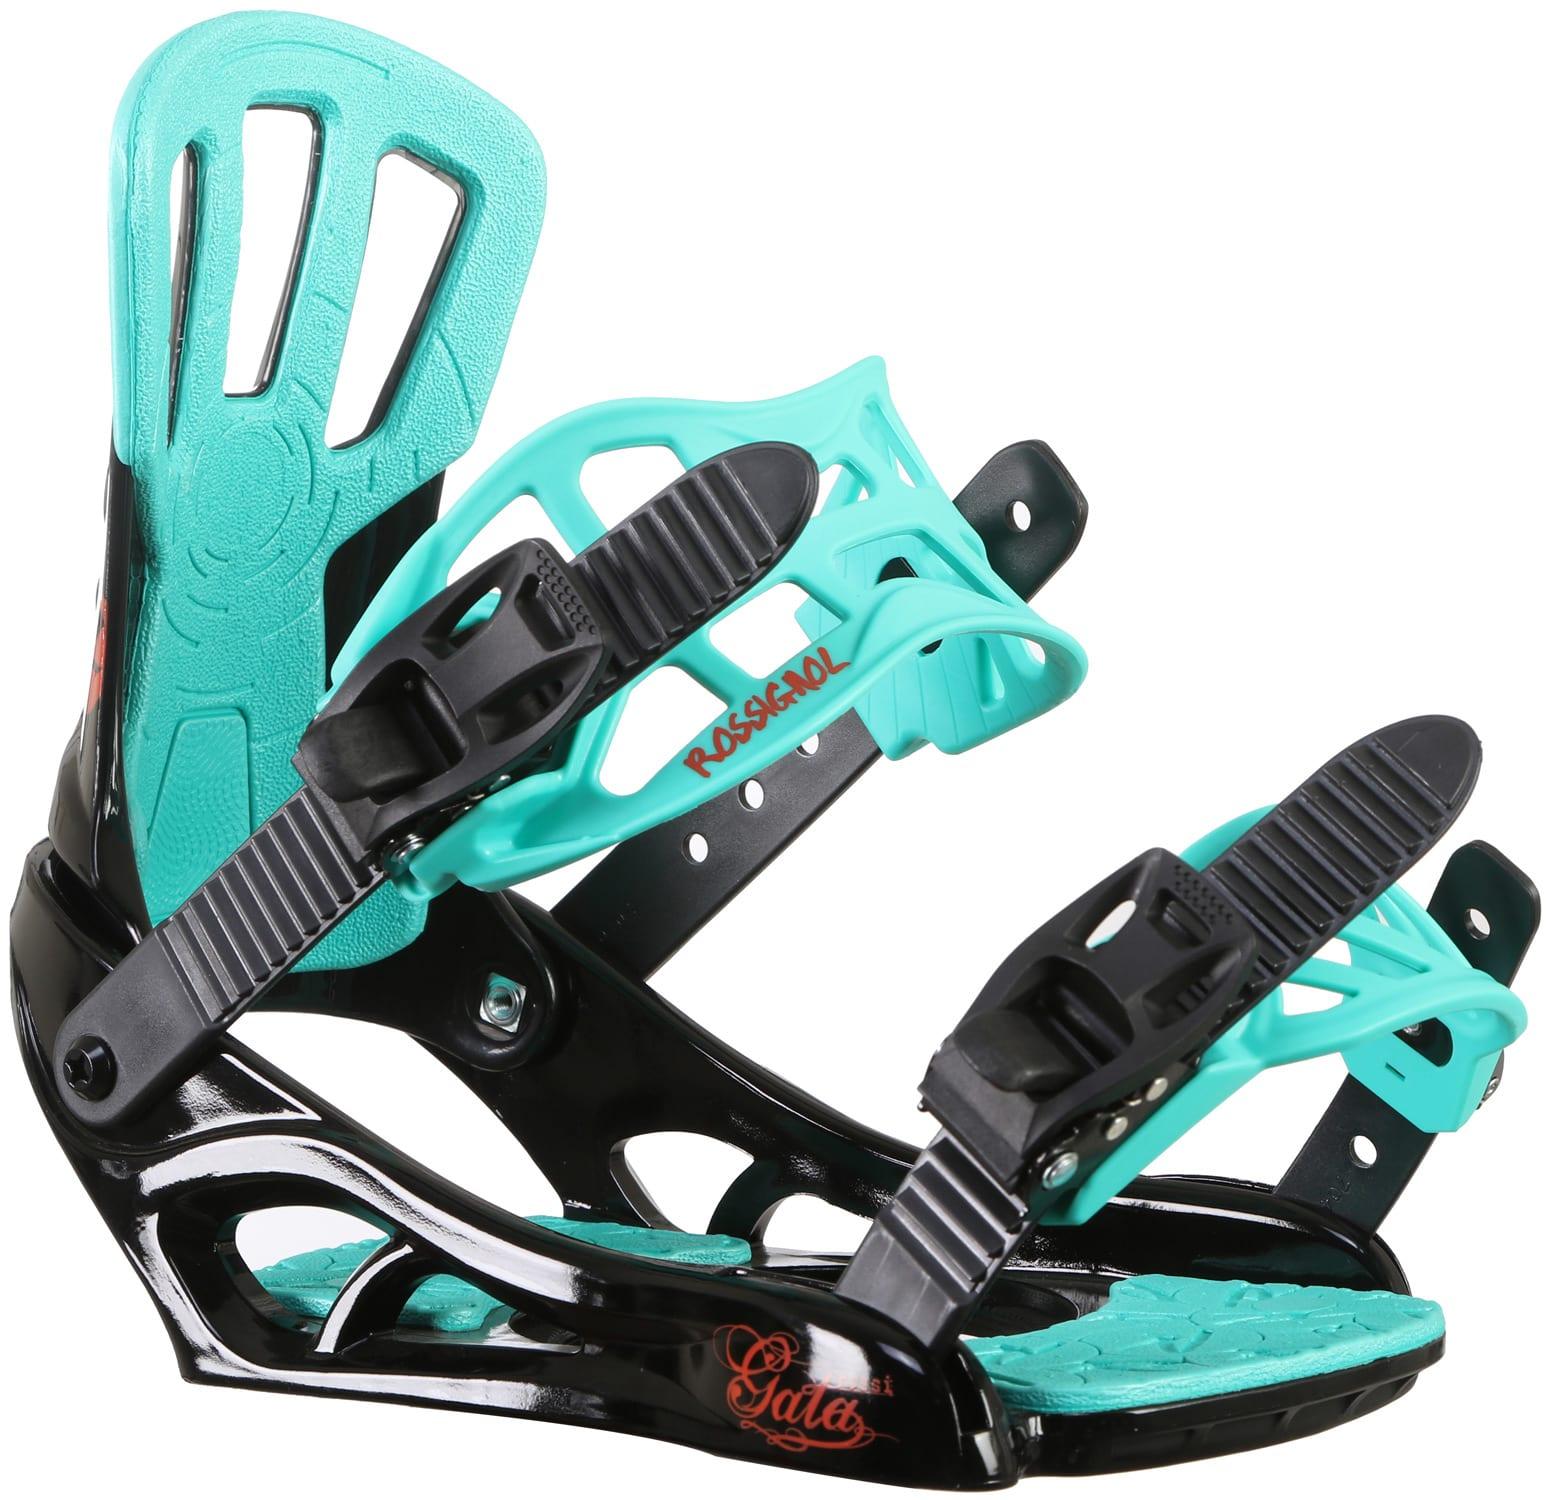 On Sale Rossignol Gala Snowboard Bindings